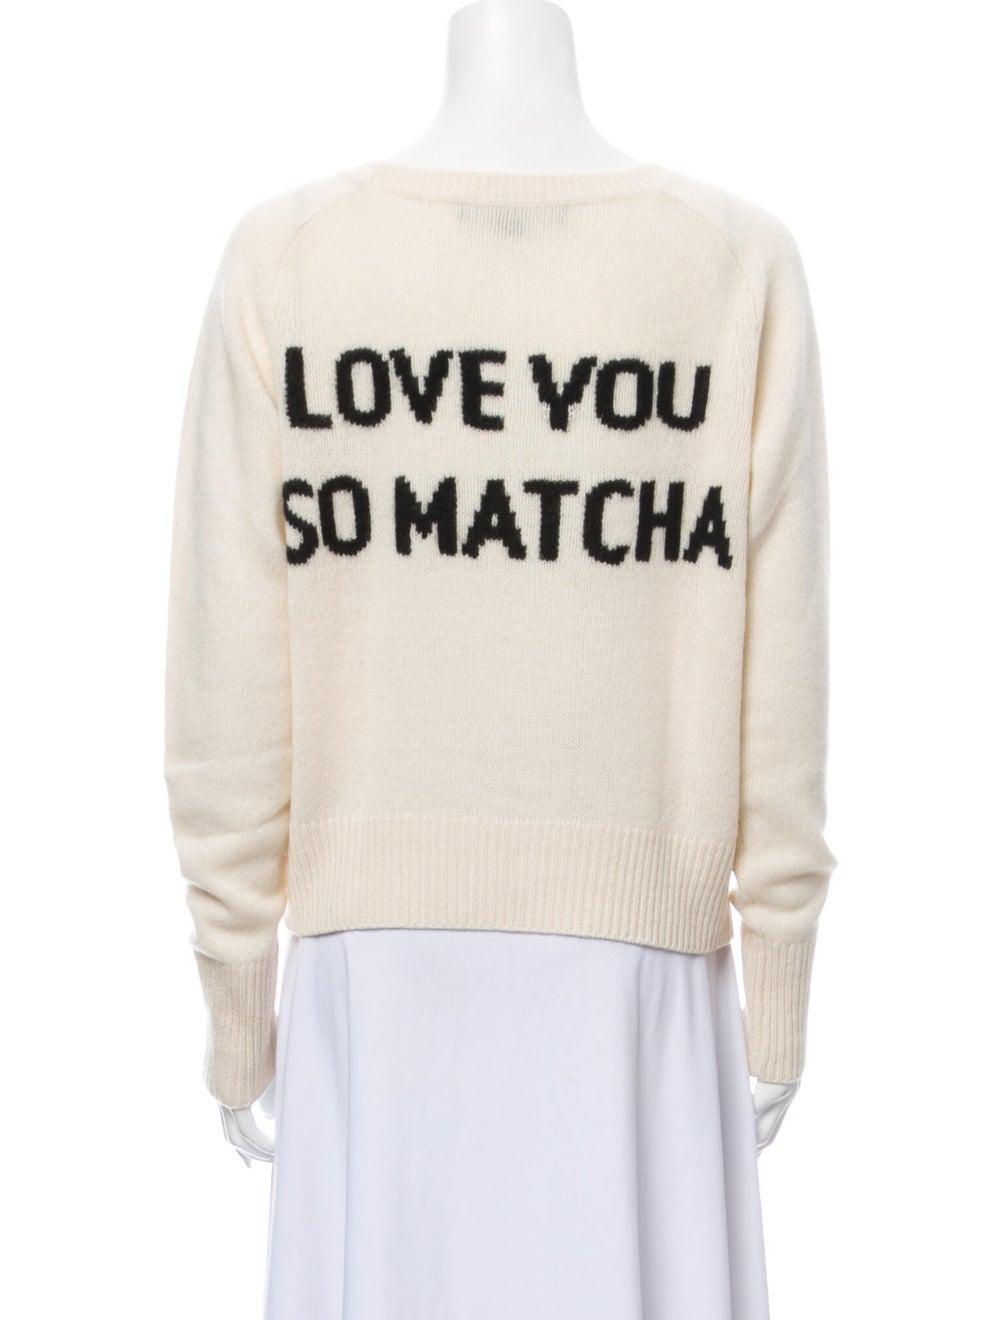 Skull Cashmere Cashmere Scoop Neck Sweater - image 3